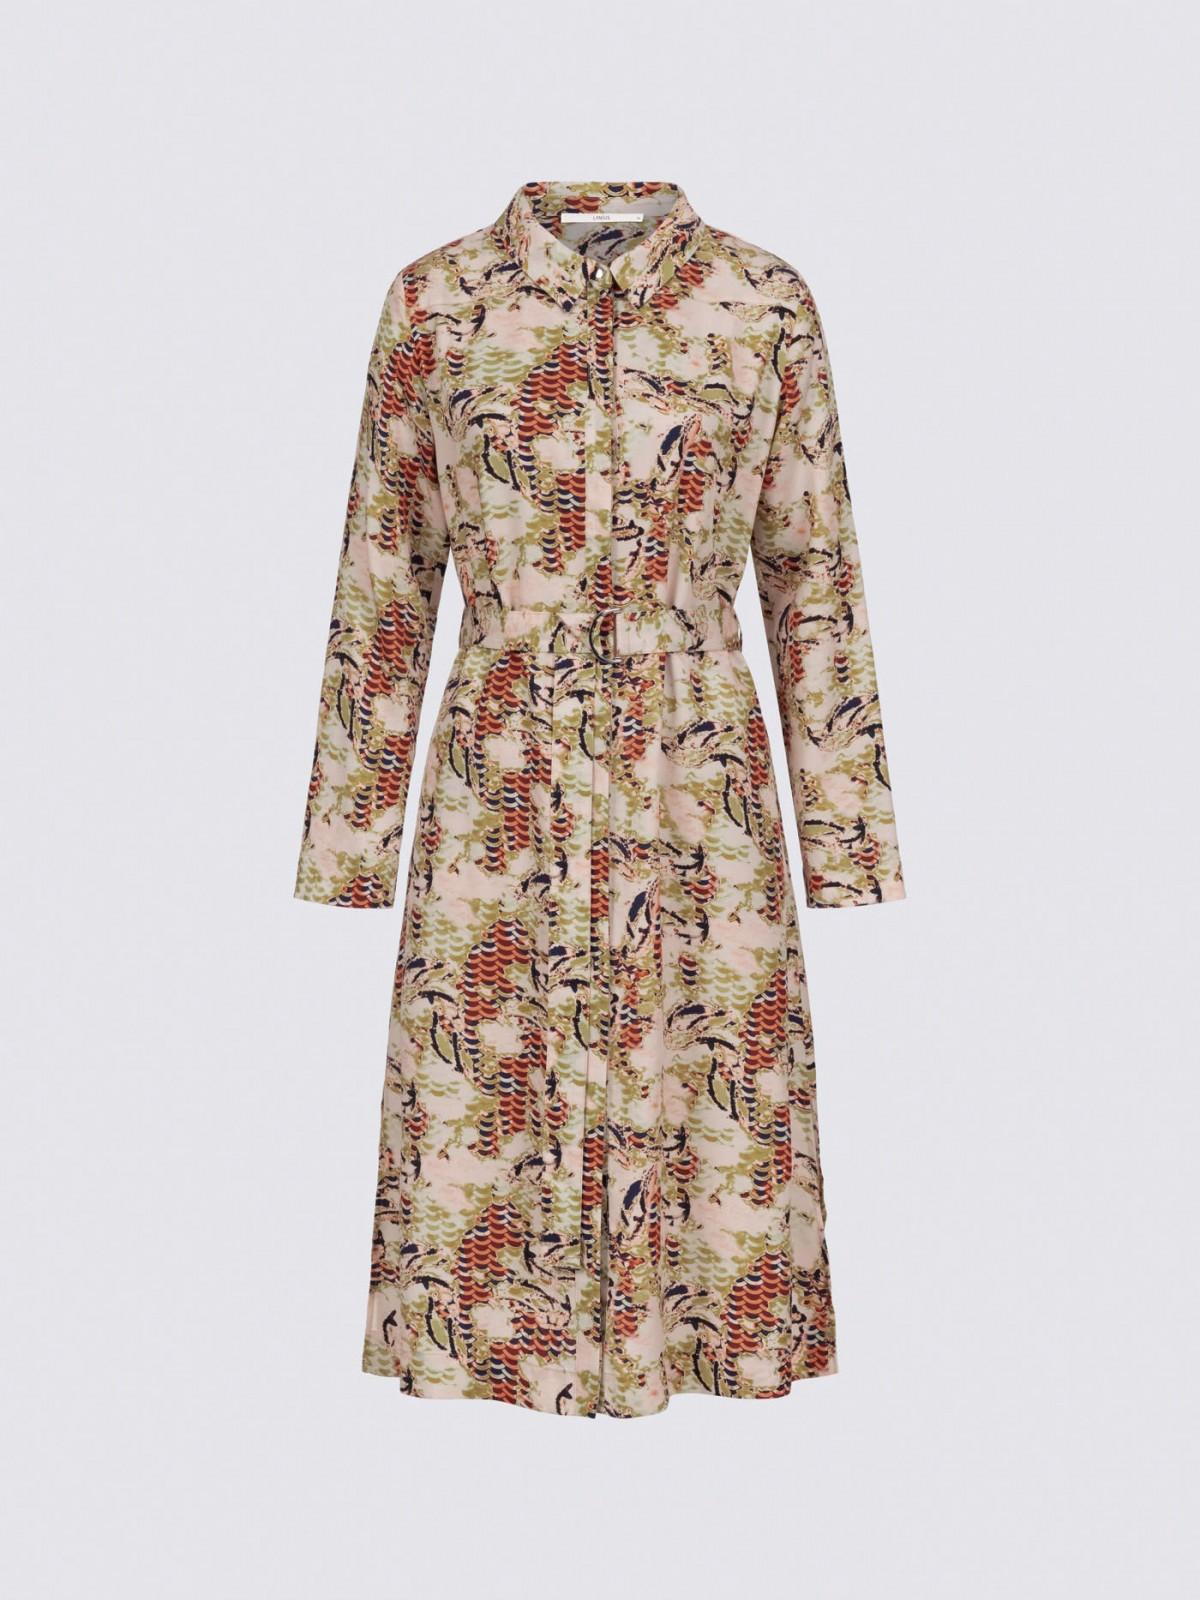 Hemdblusenkleid mir Print aus Lyocell (TENCEL™)